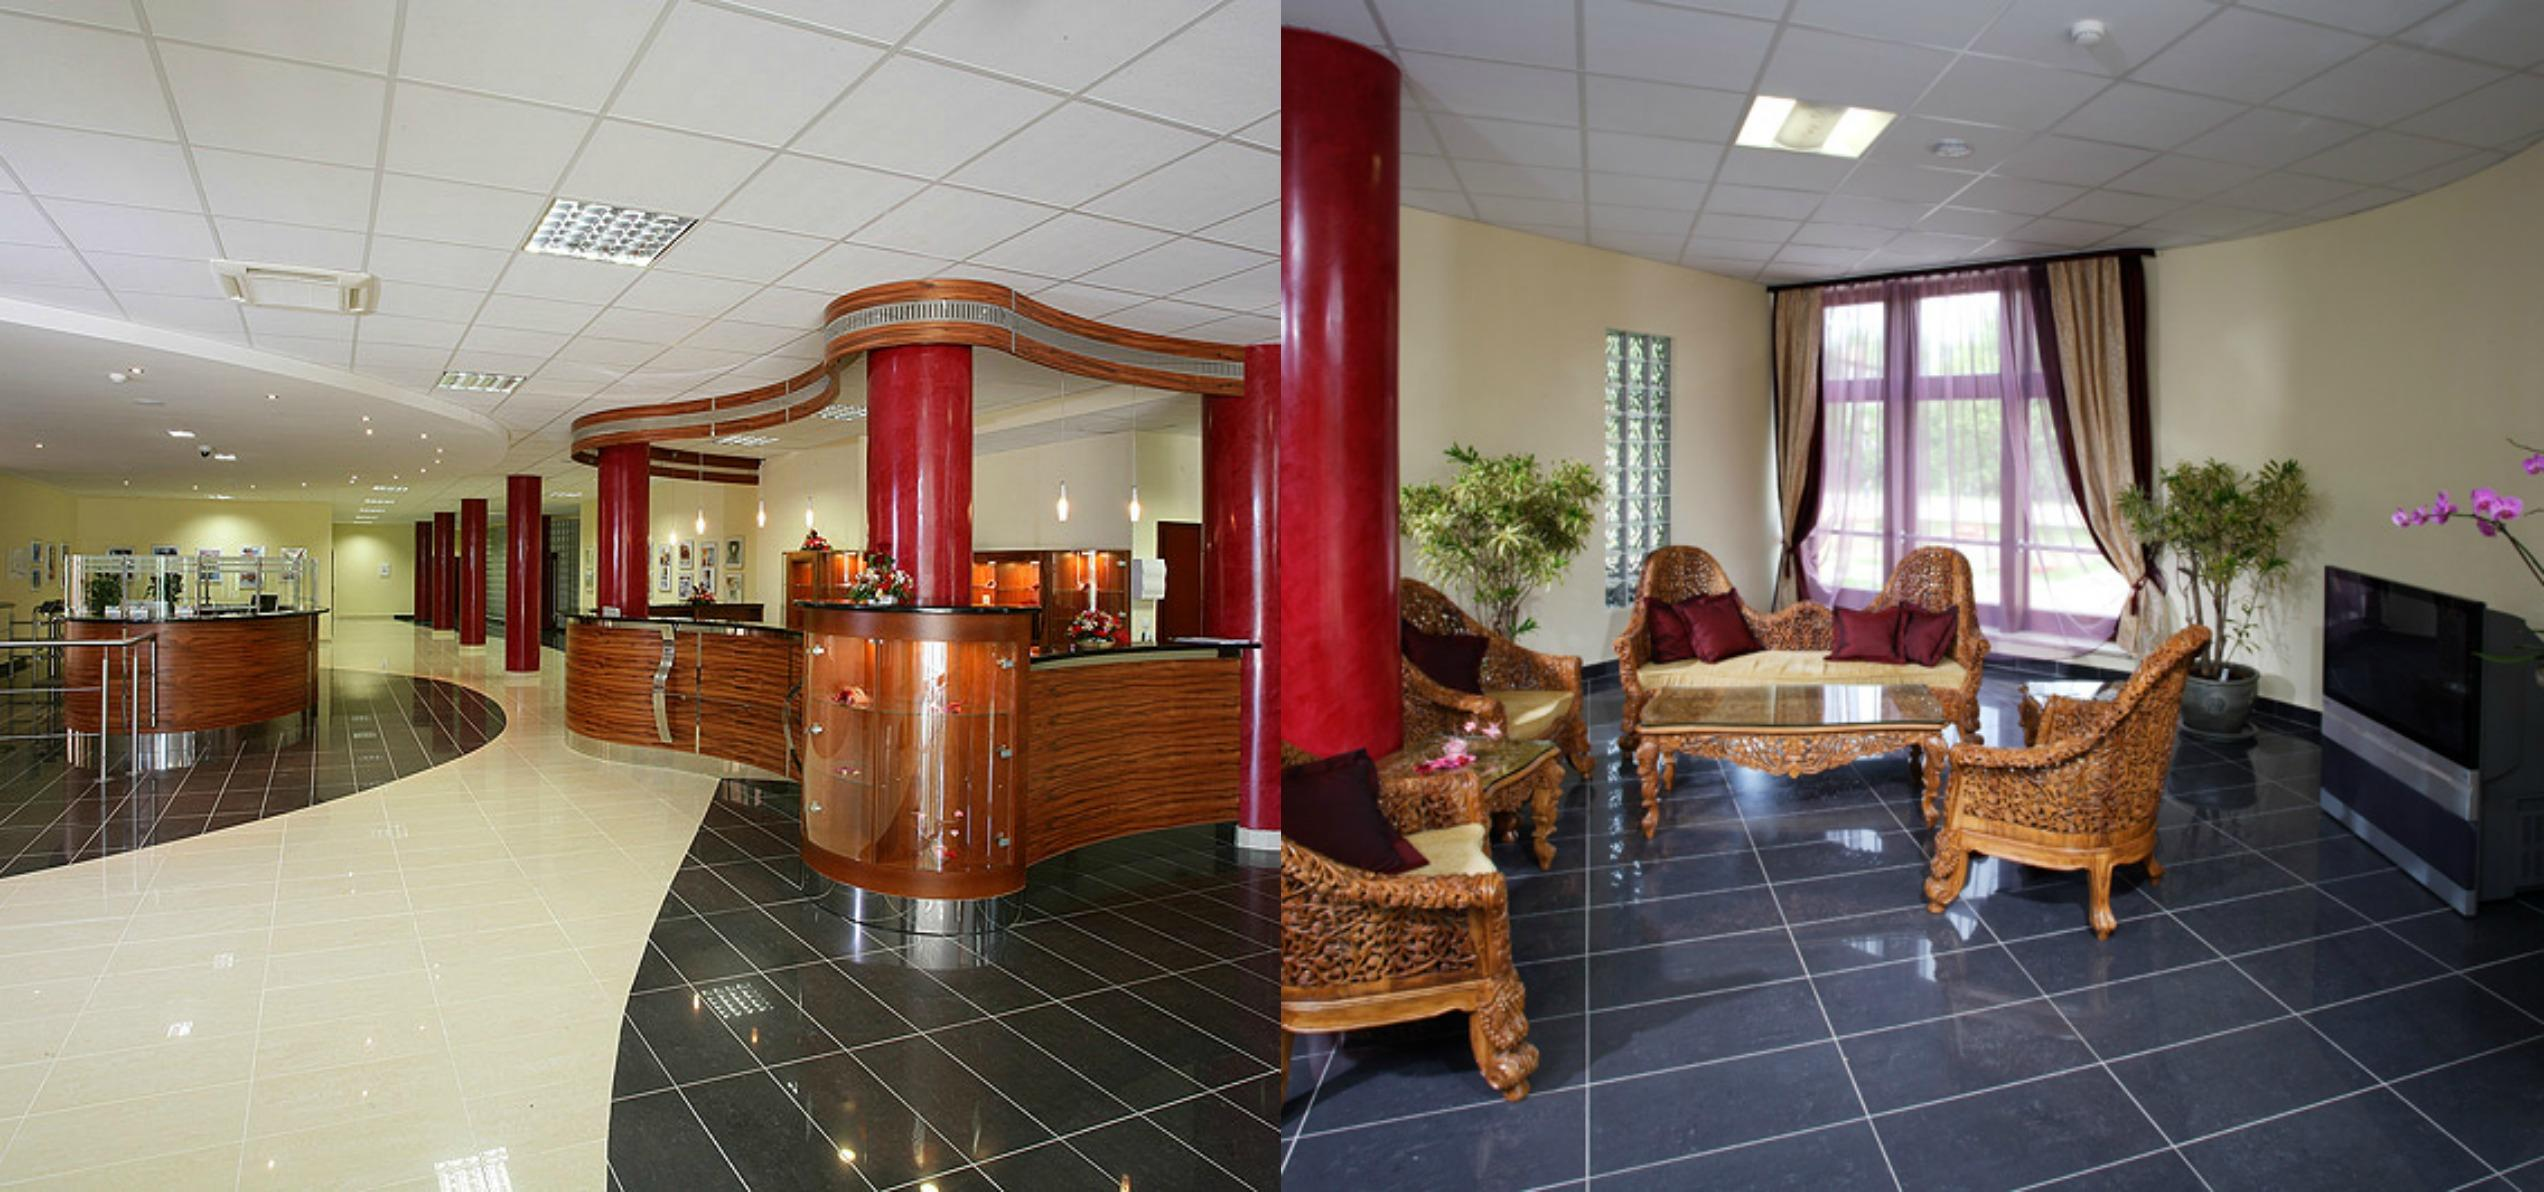 wellnes hotel patince